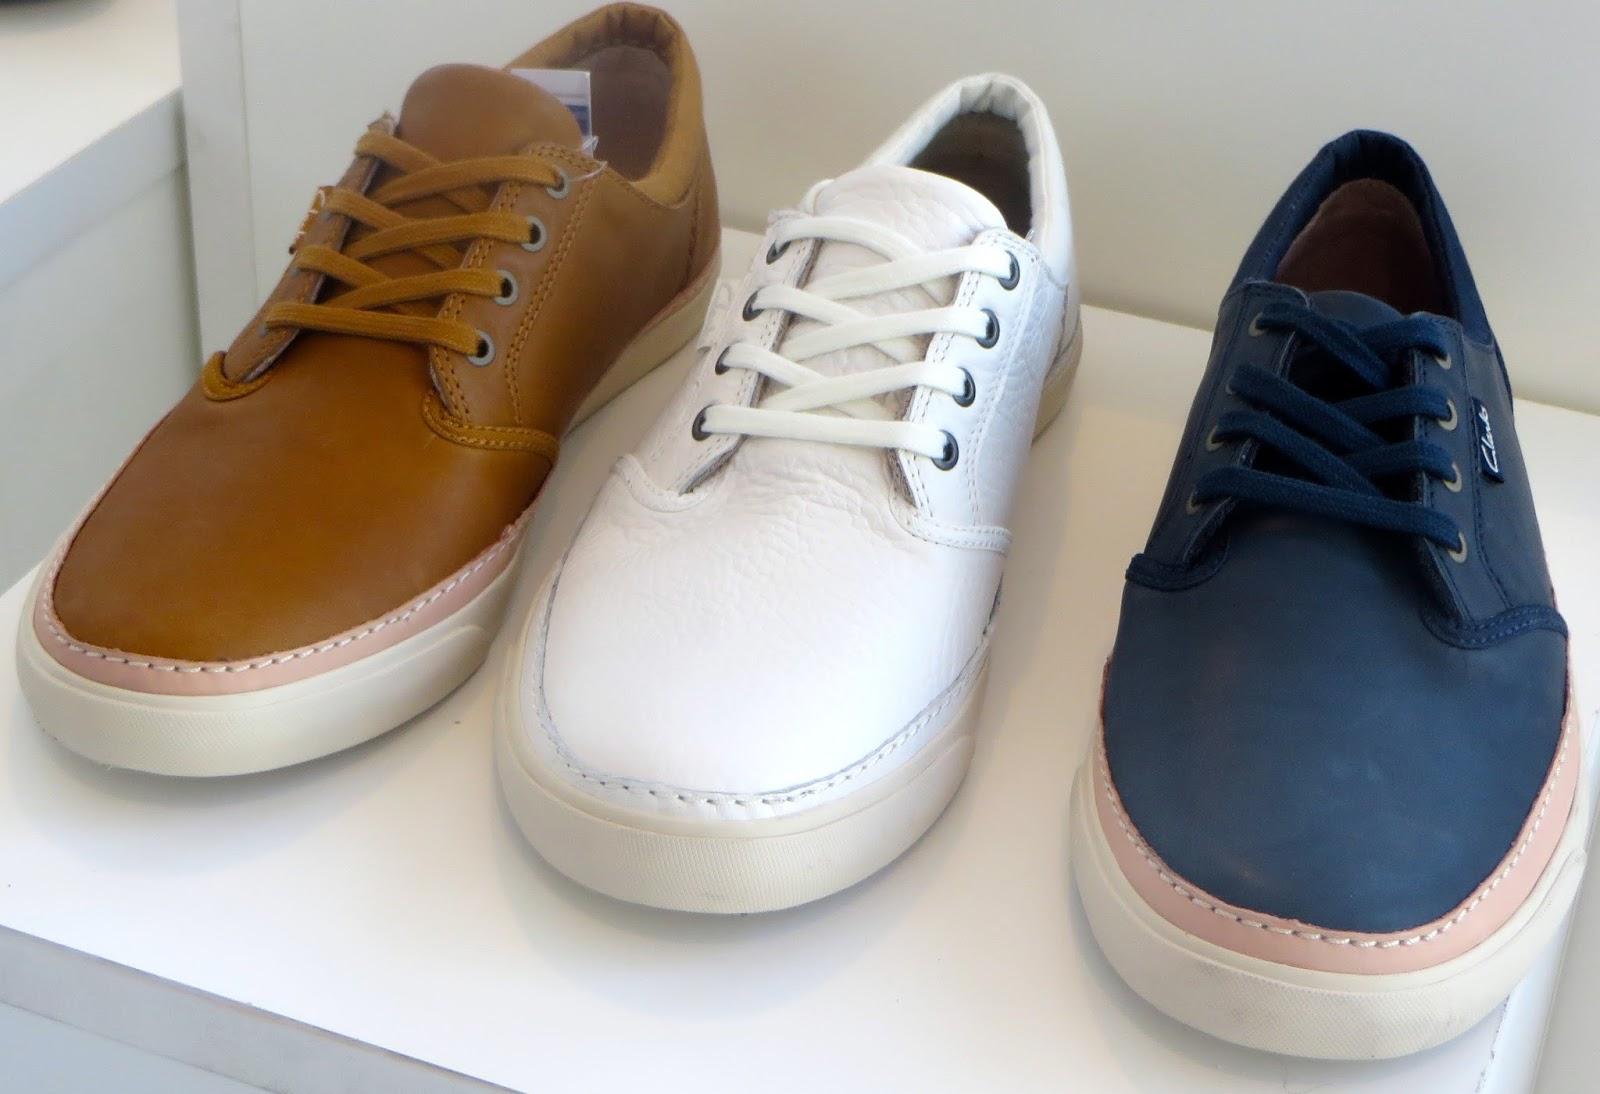 b5bc41c6b8c1 CLARKS Men s Shoes Sandals Spring 2015